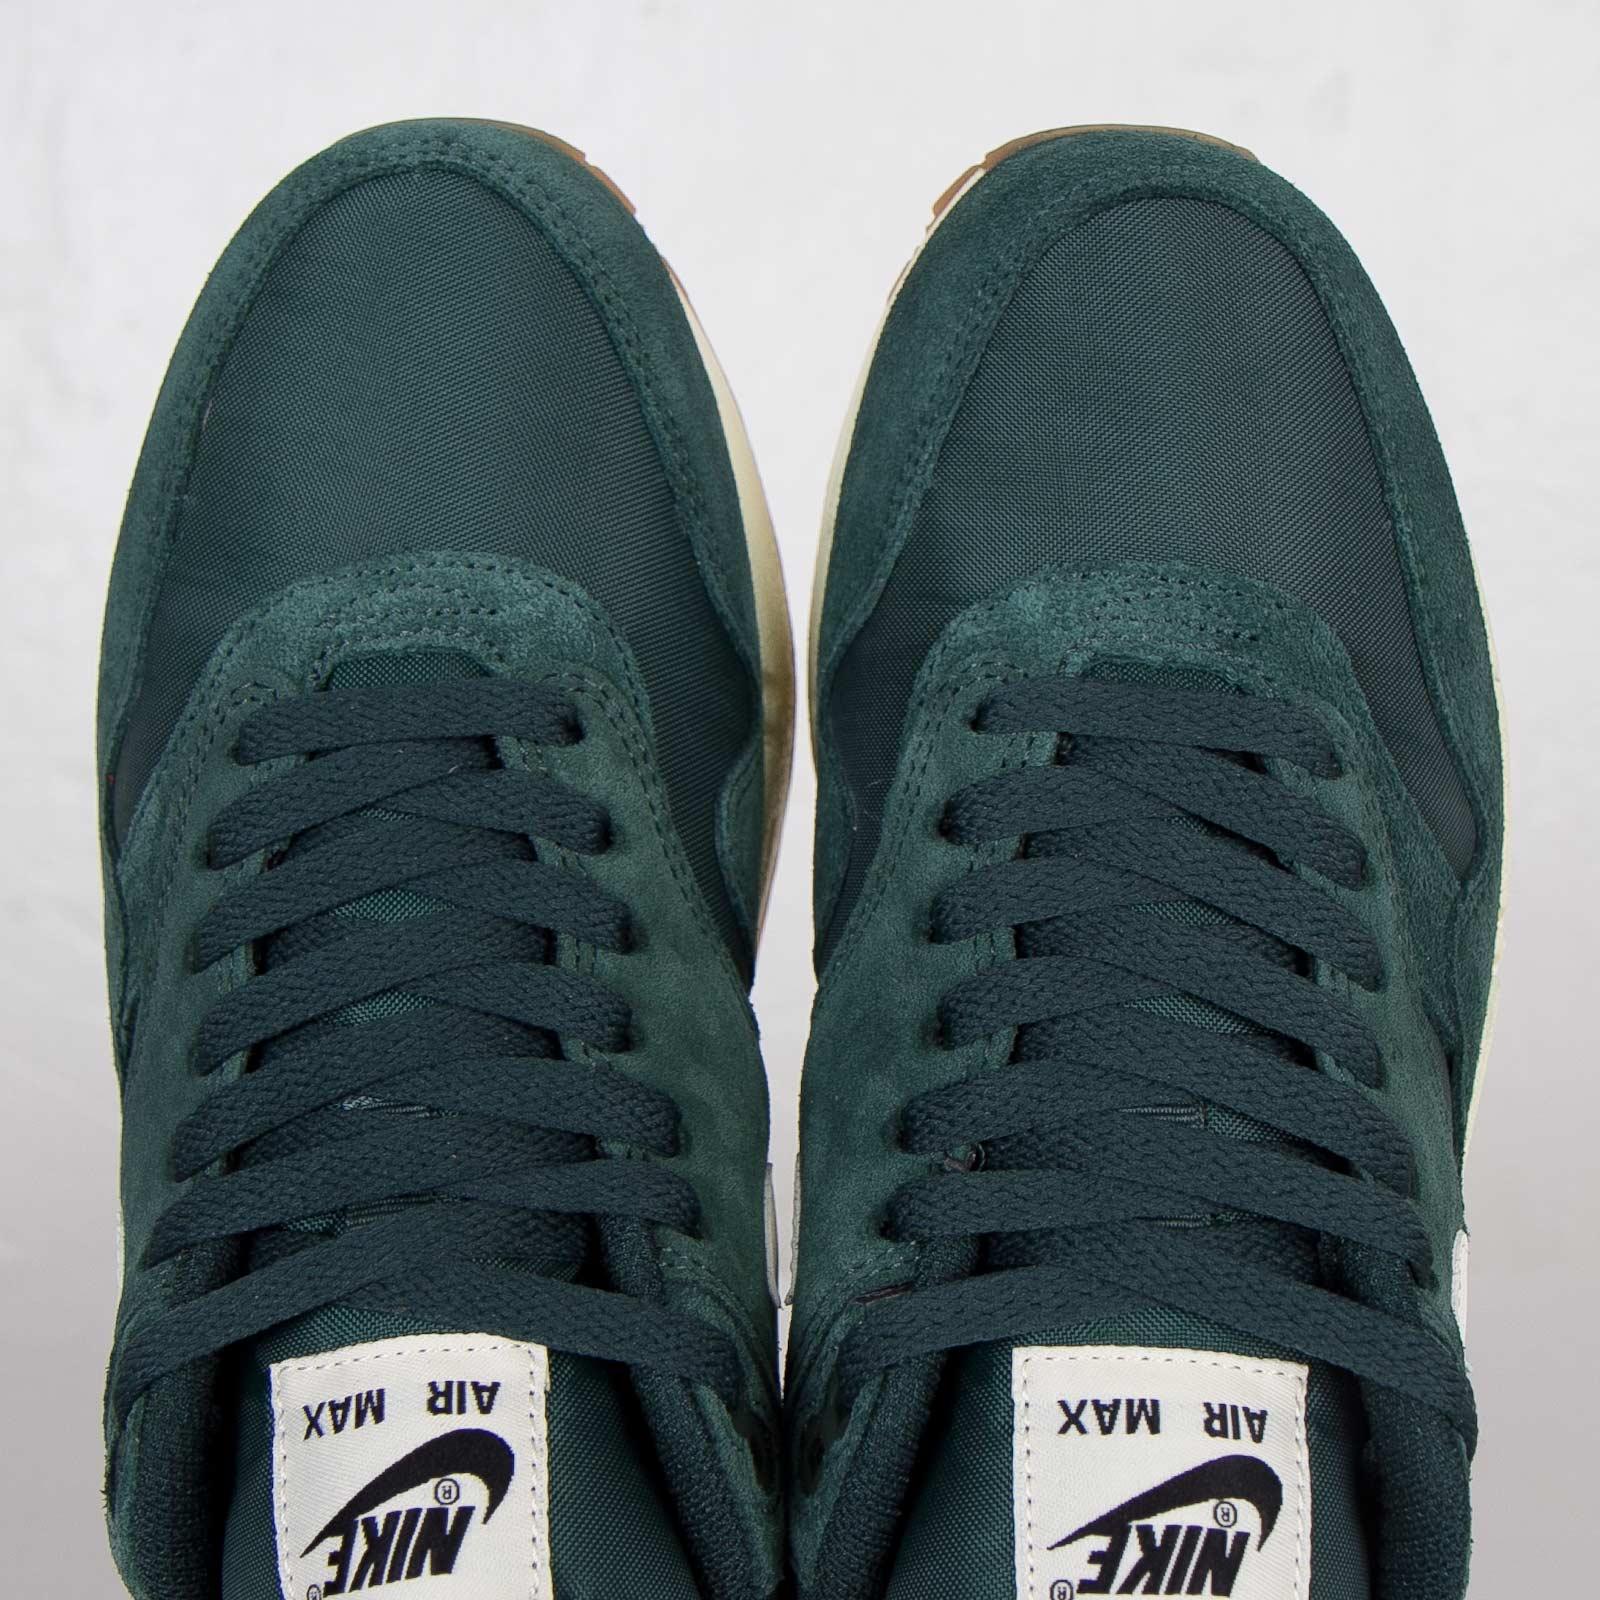 73e171e05f Nike Air Max 1 Essential - 537383-311 - Sneakersnstuff | sneakers &  streetwear online since 1999